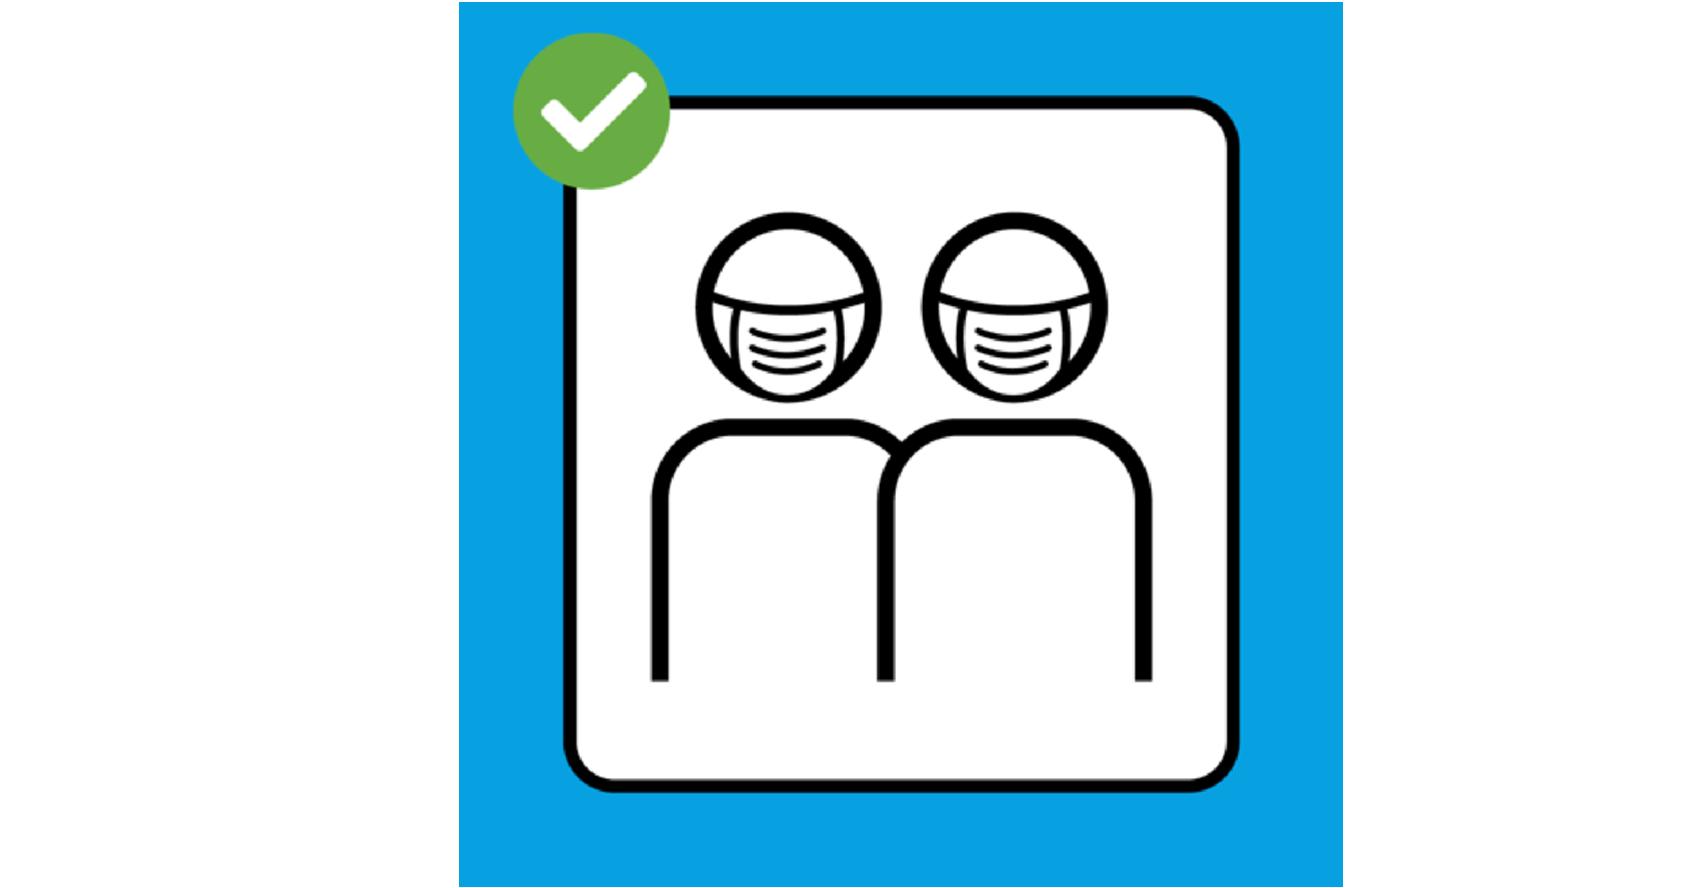 COVID-19: Uso obrigatório de máscara nos transportes públicos